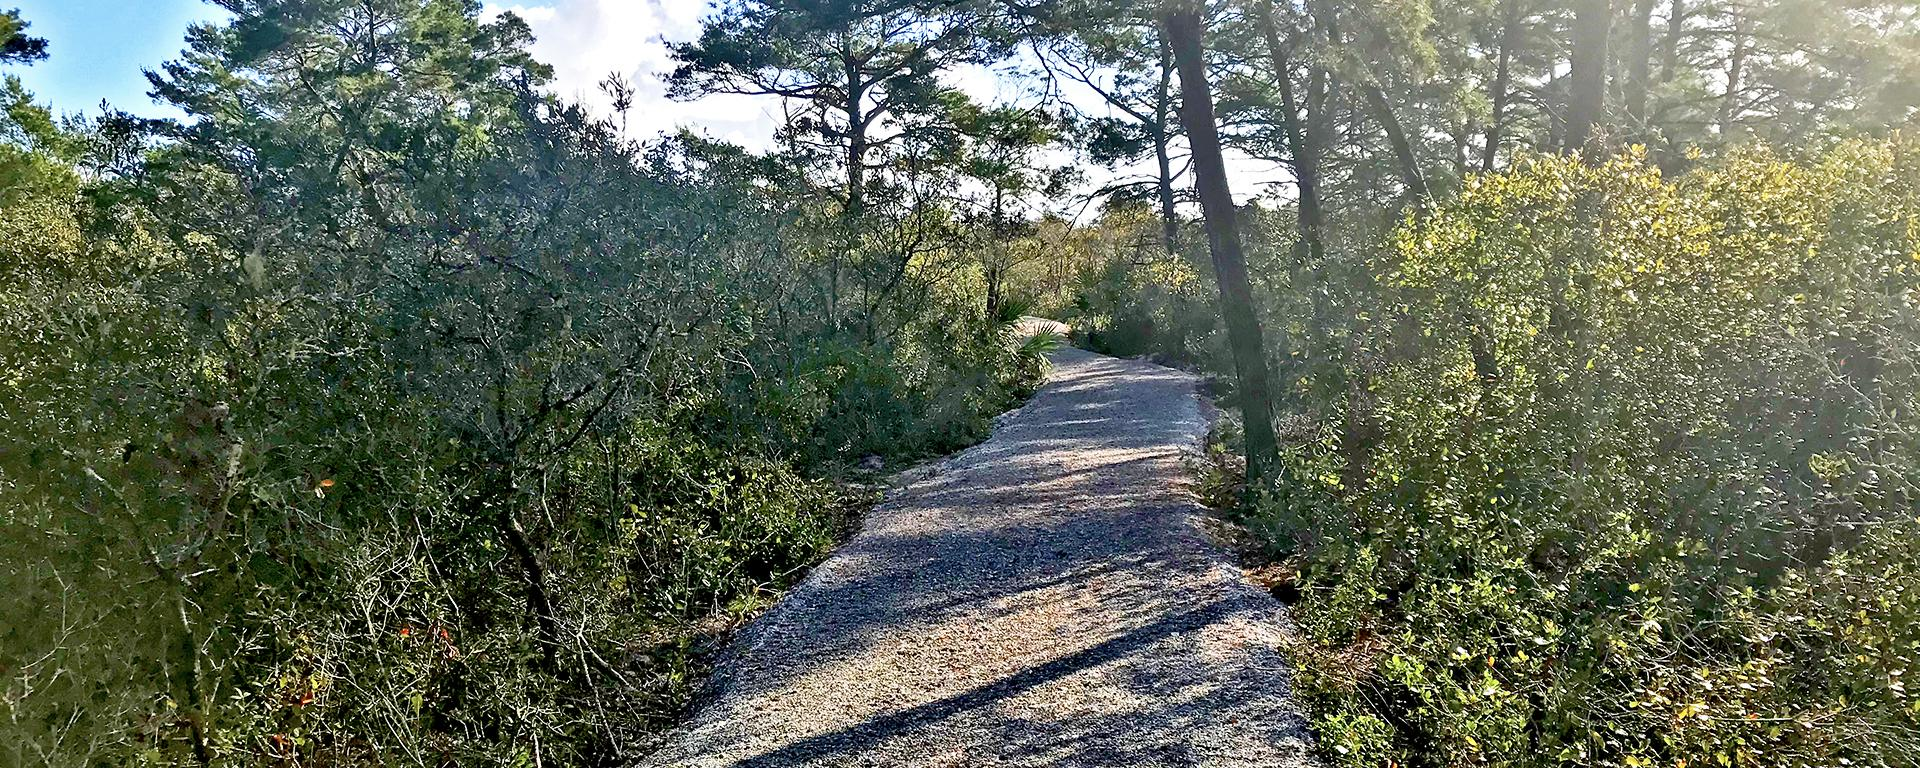 A gravel trail through the Hobe Sound Scrub Preserve